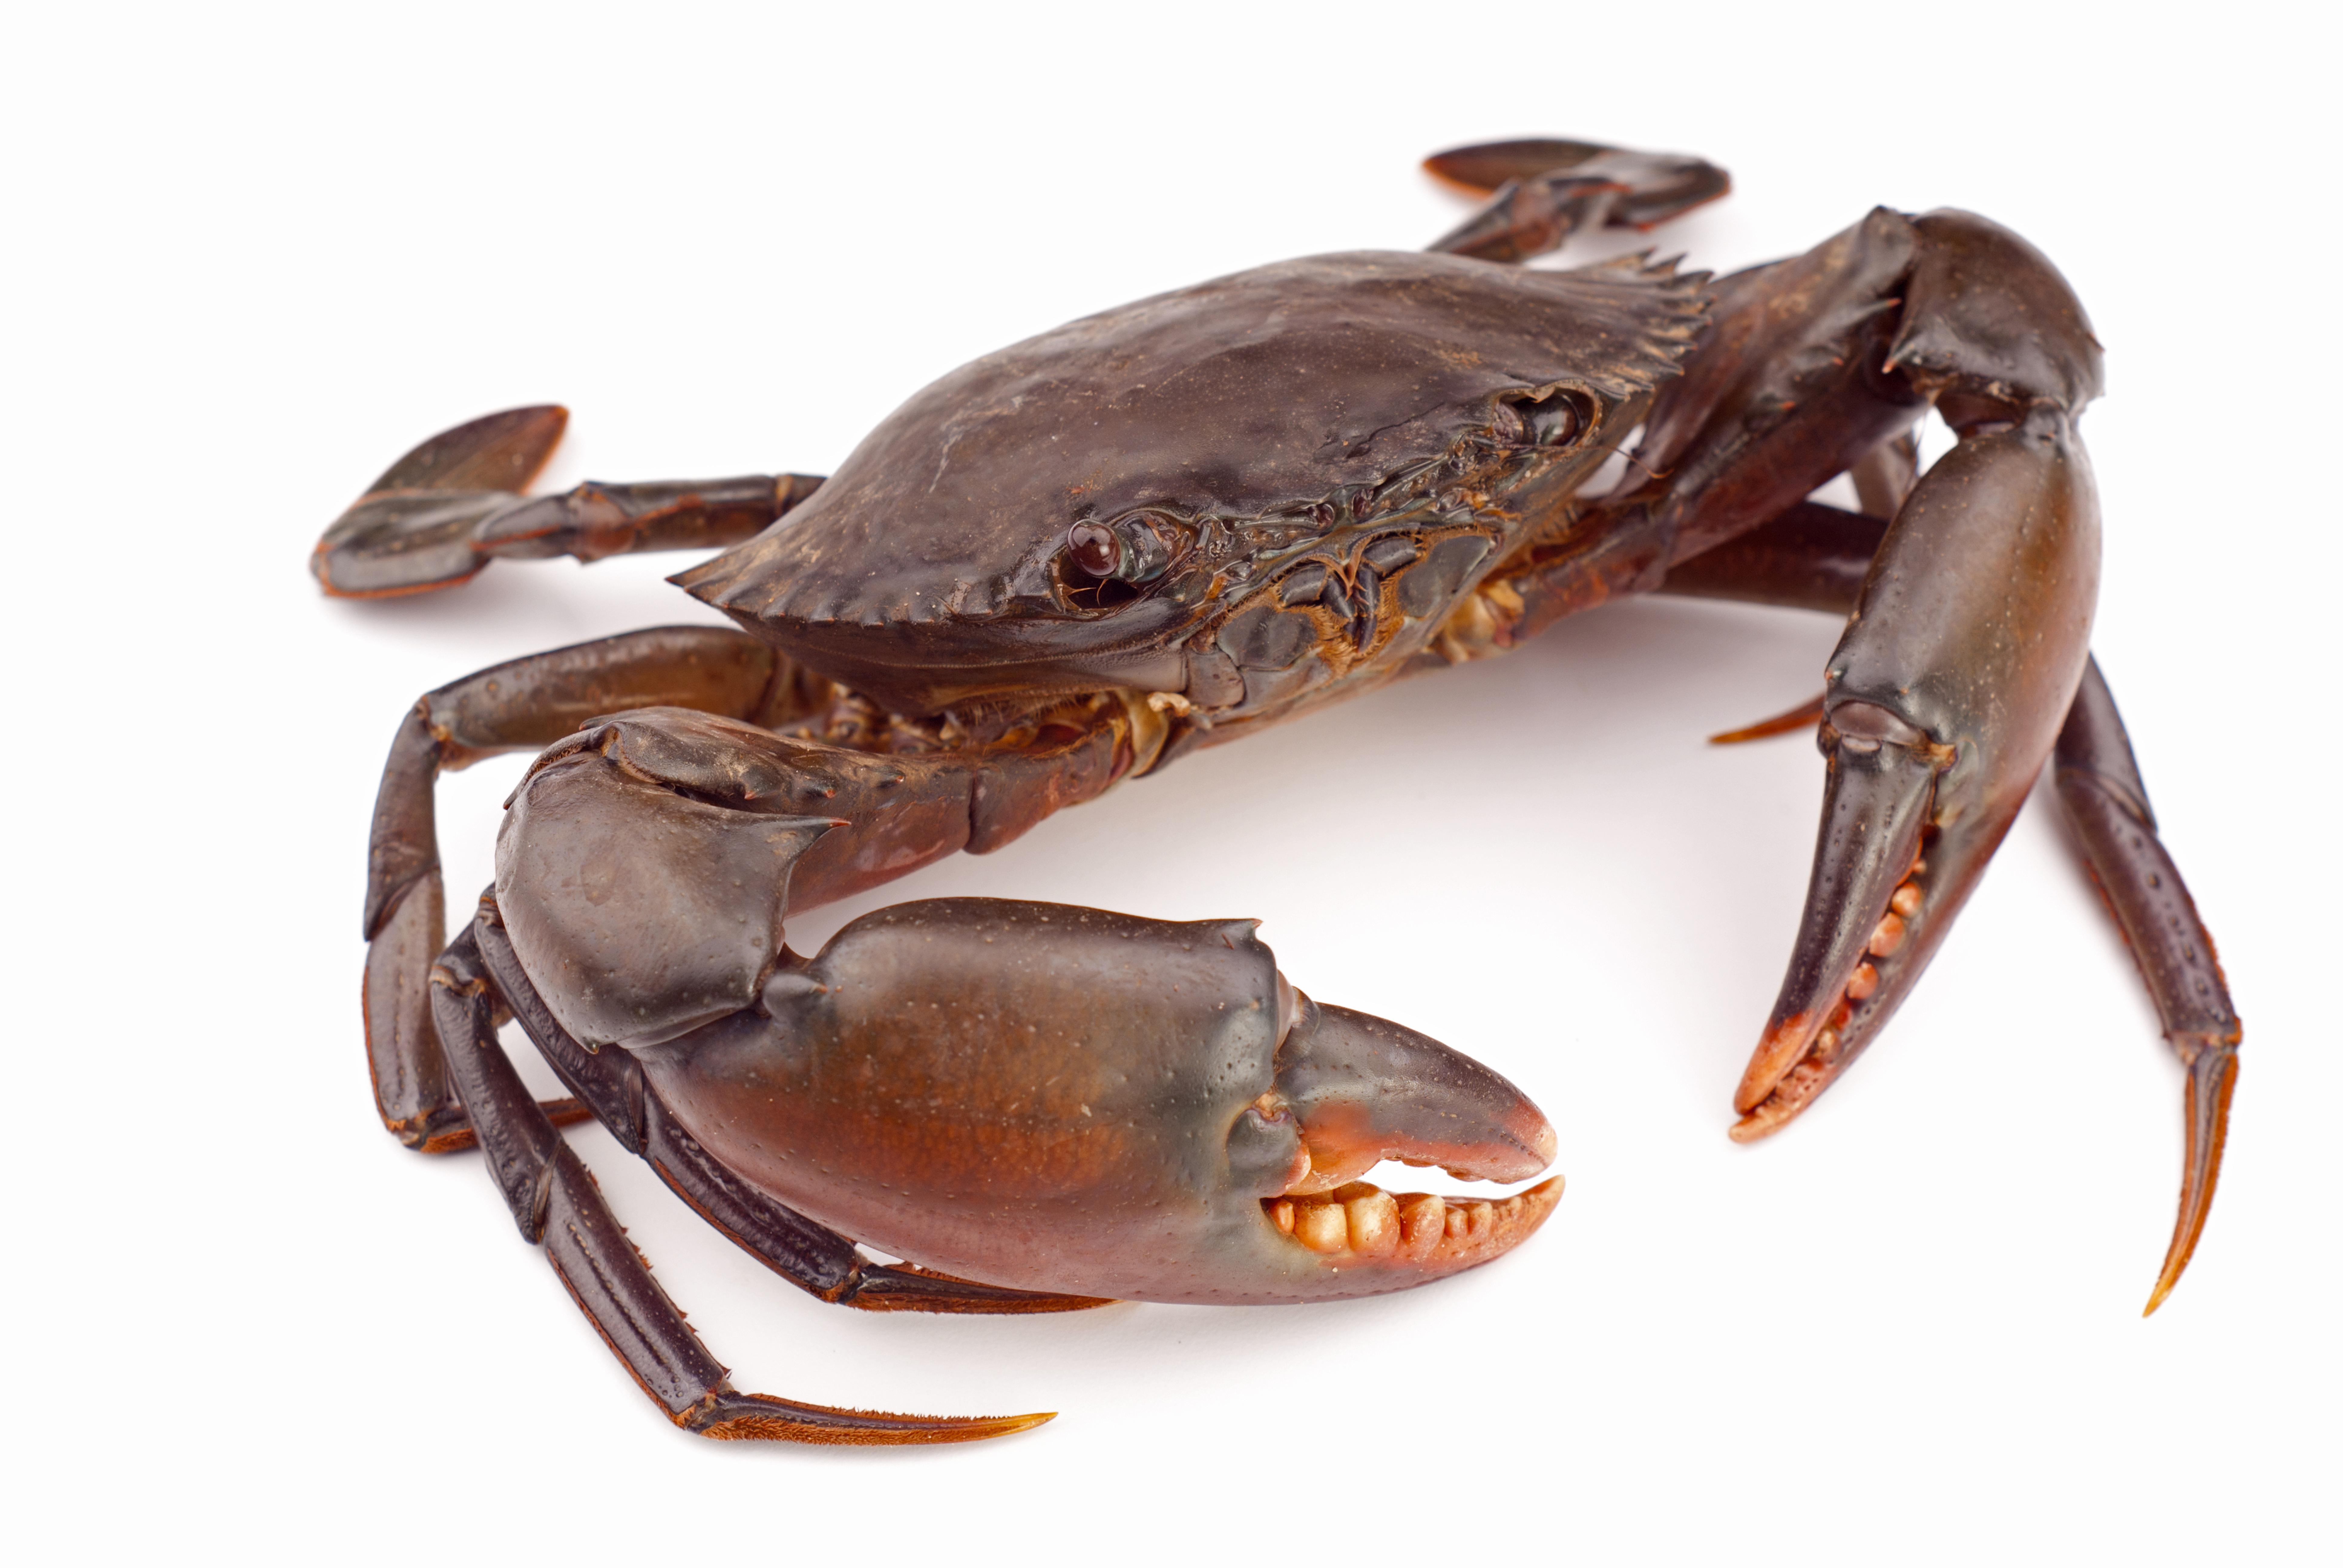 Crab - Crab Image PNG HD